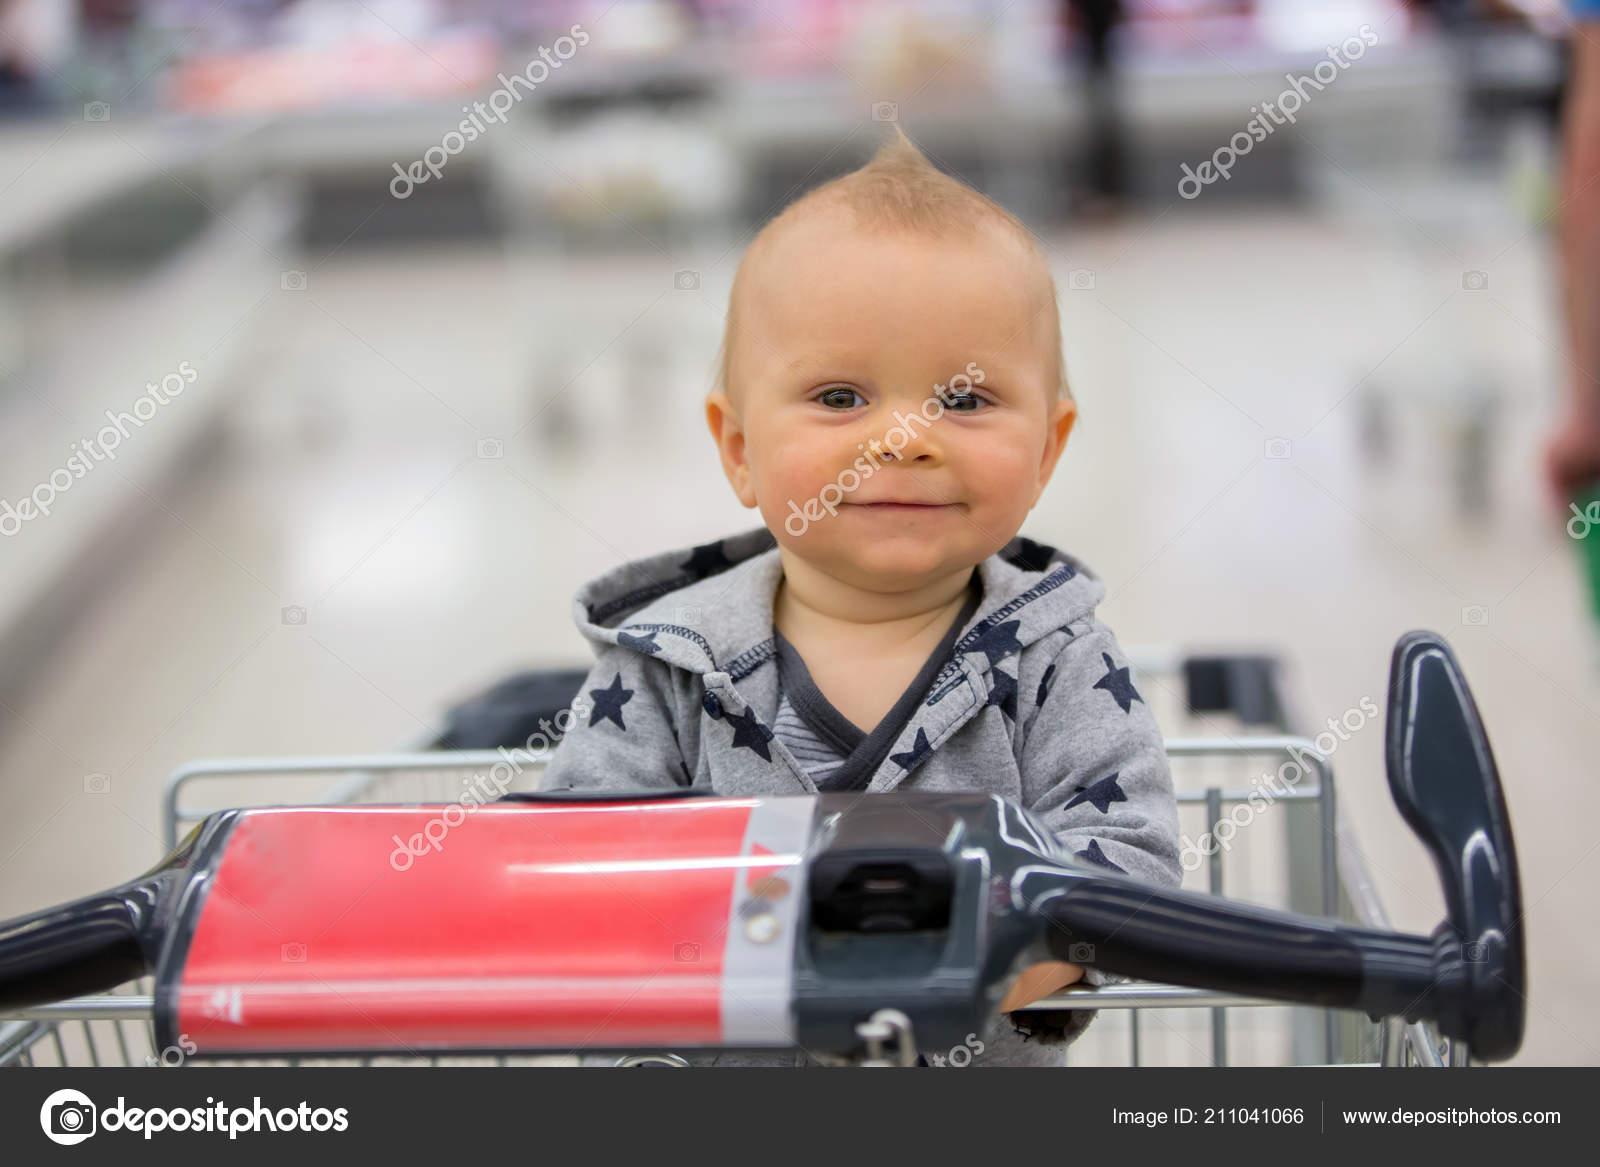 2d567eae8 Toddler Baby Boy Sitting Shopping Cart Grocery Store Smiling Eating ...